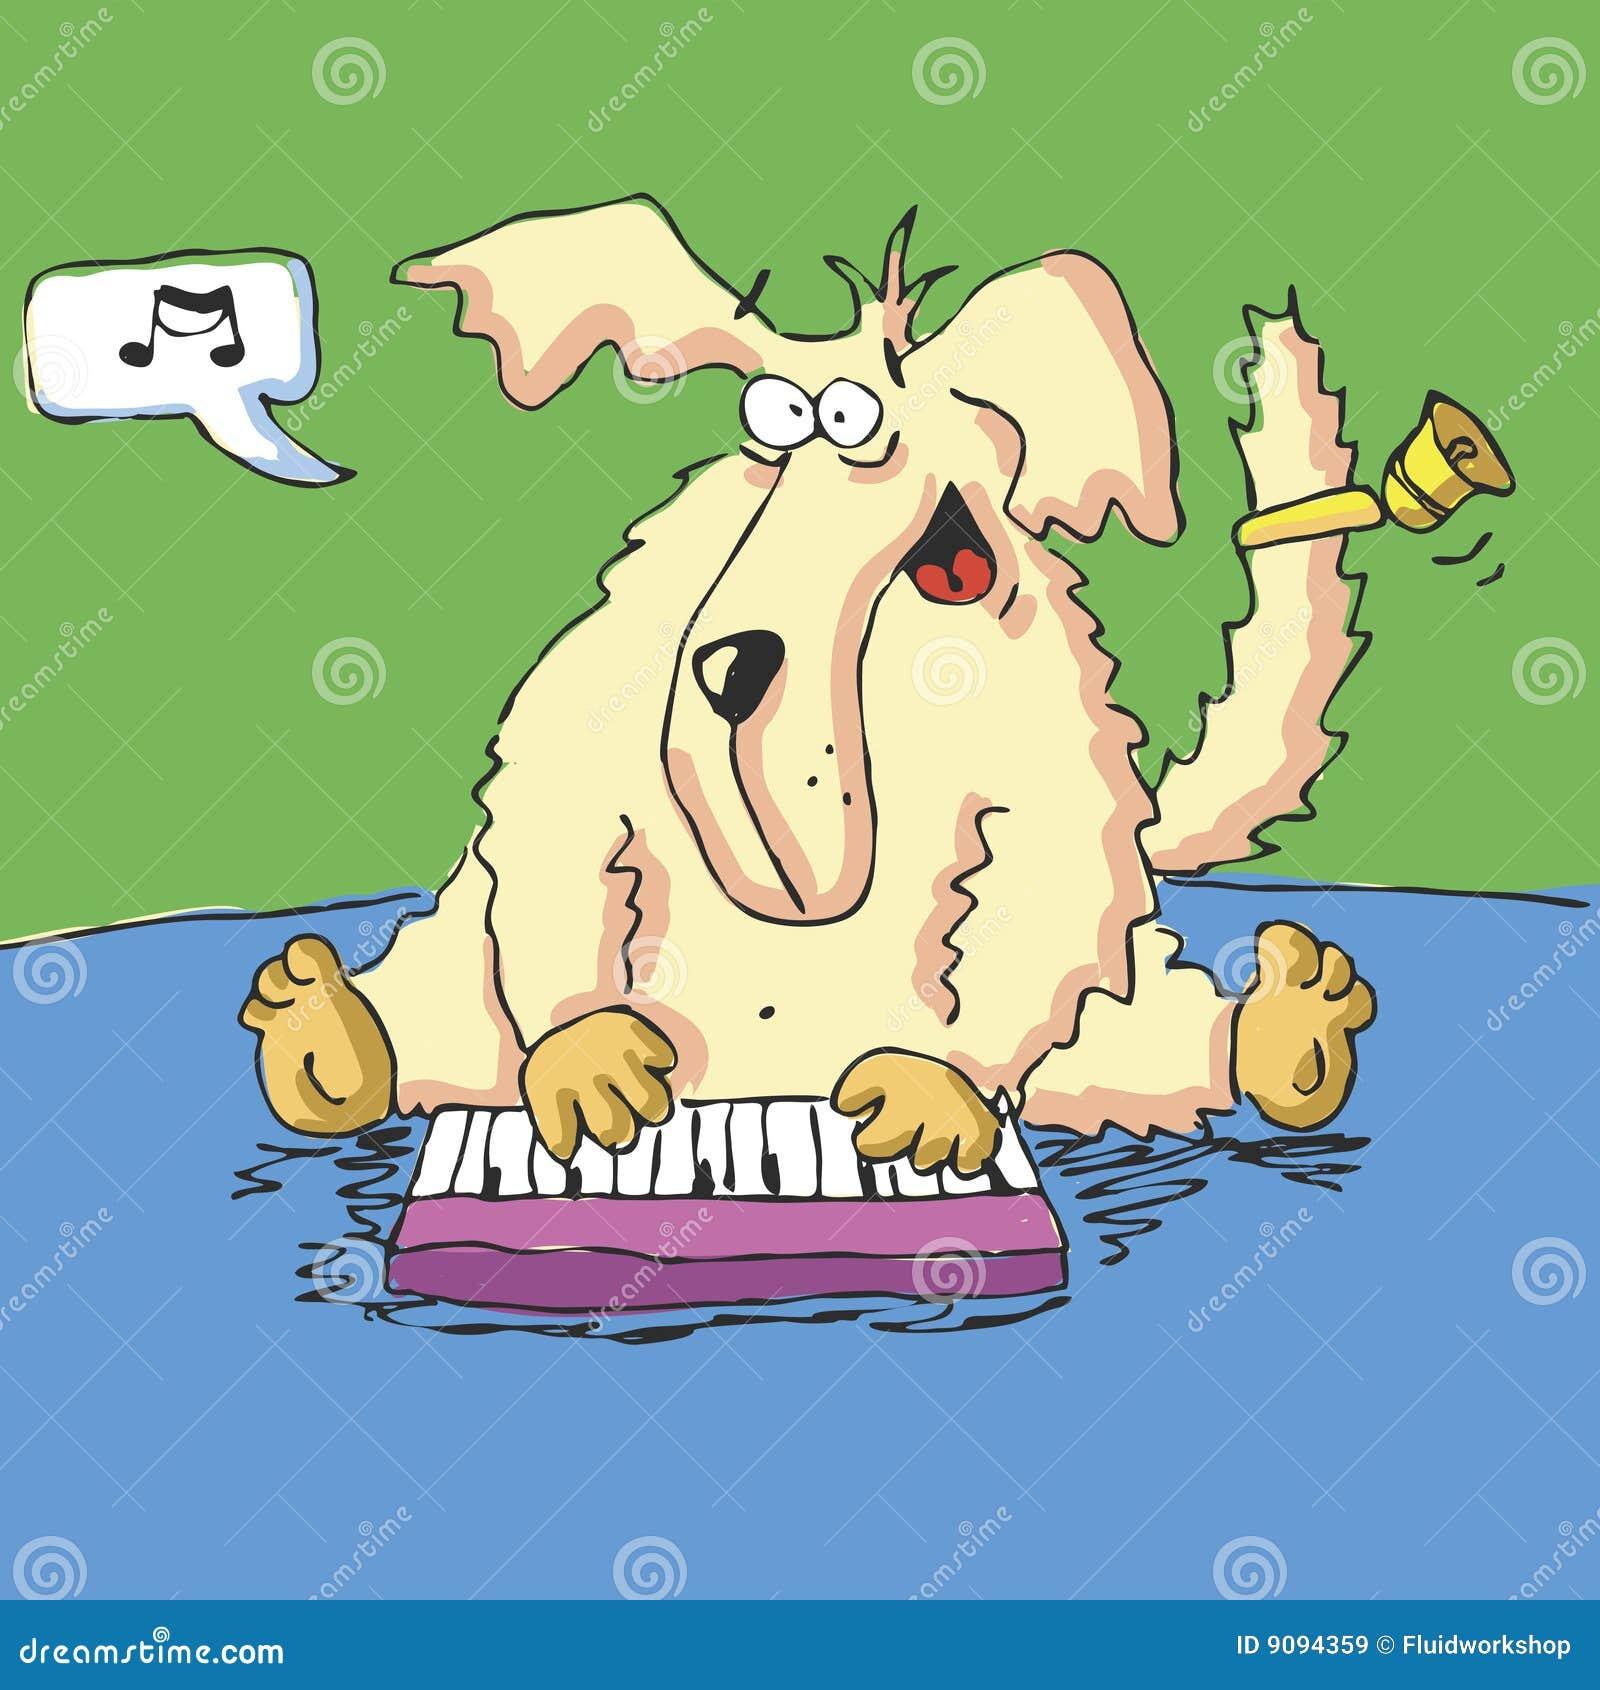 Vektorjagdhund spielt Nizza Musik